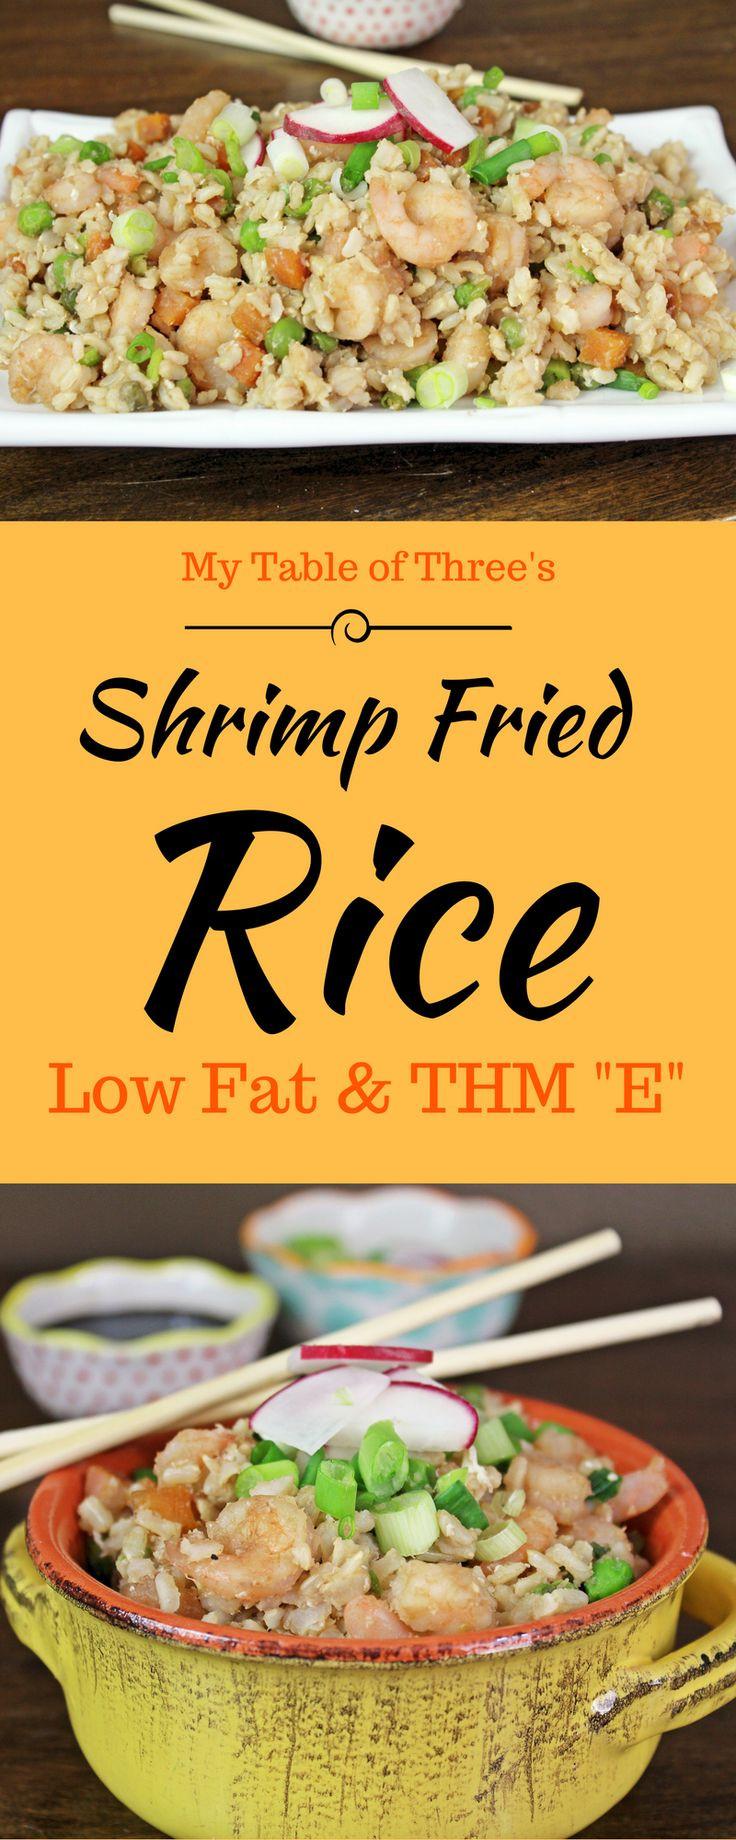 Easy Low Cholesterol Recipes For Dinner  Best 25 Shrimp fried rice ideas on Pinterest